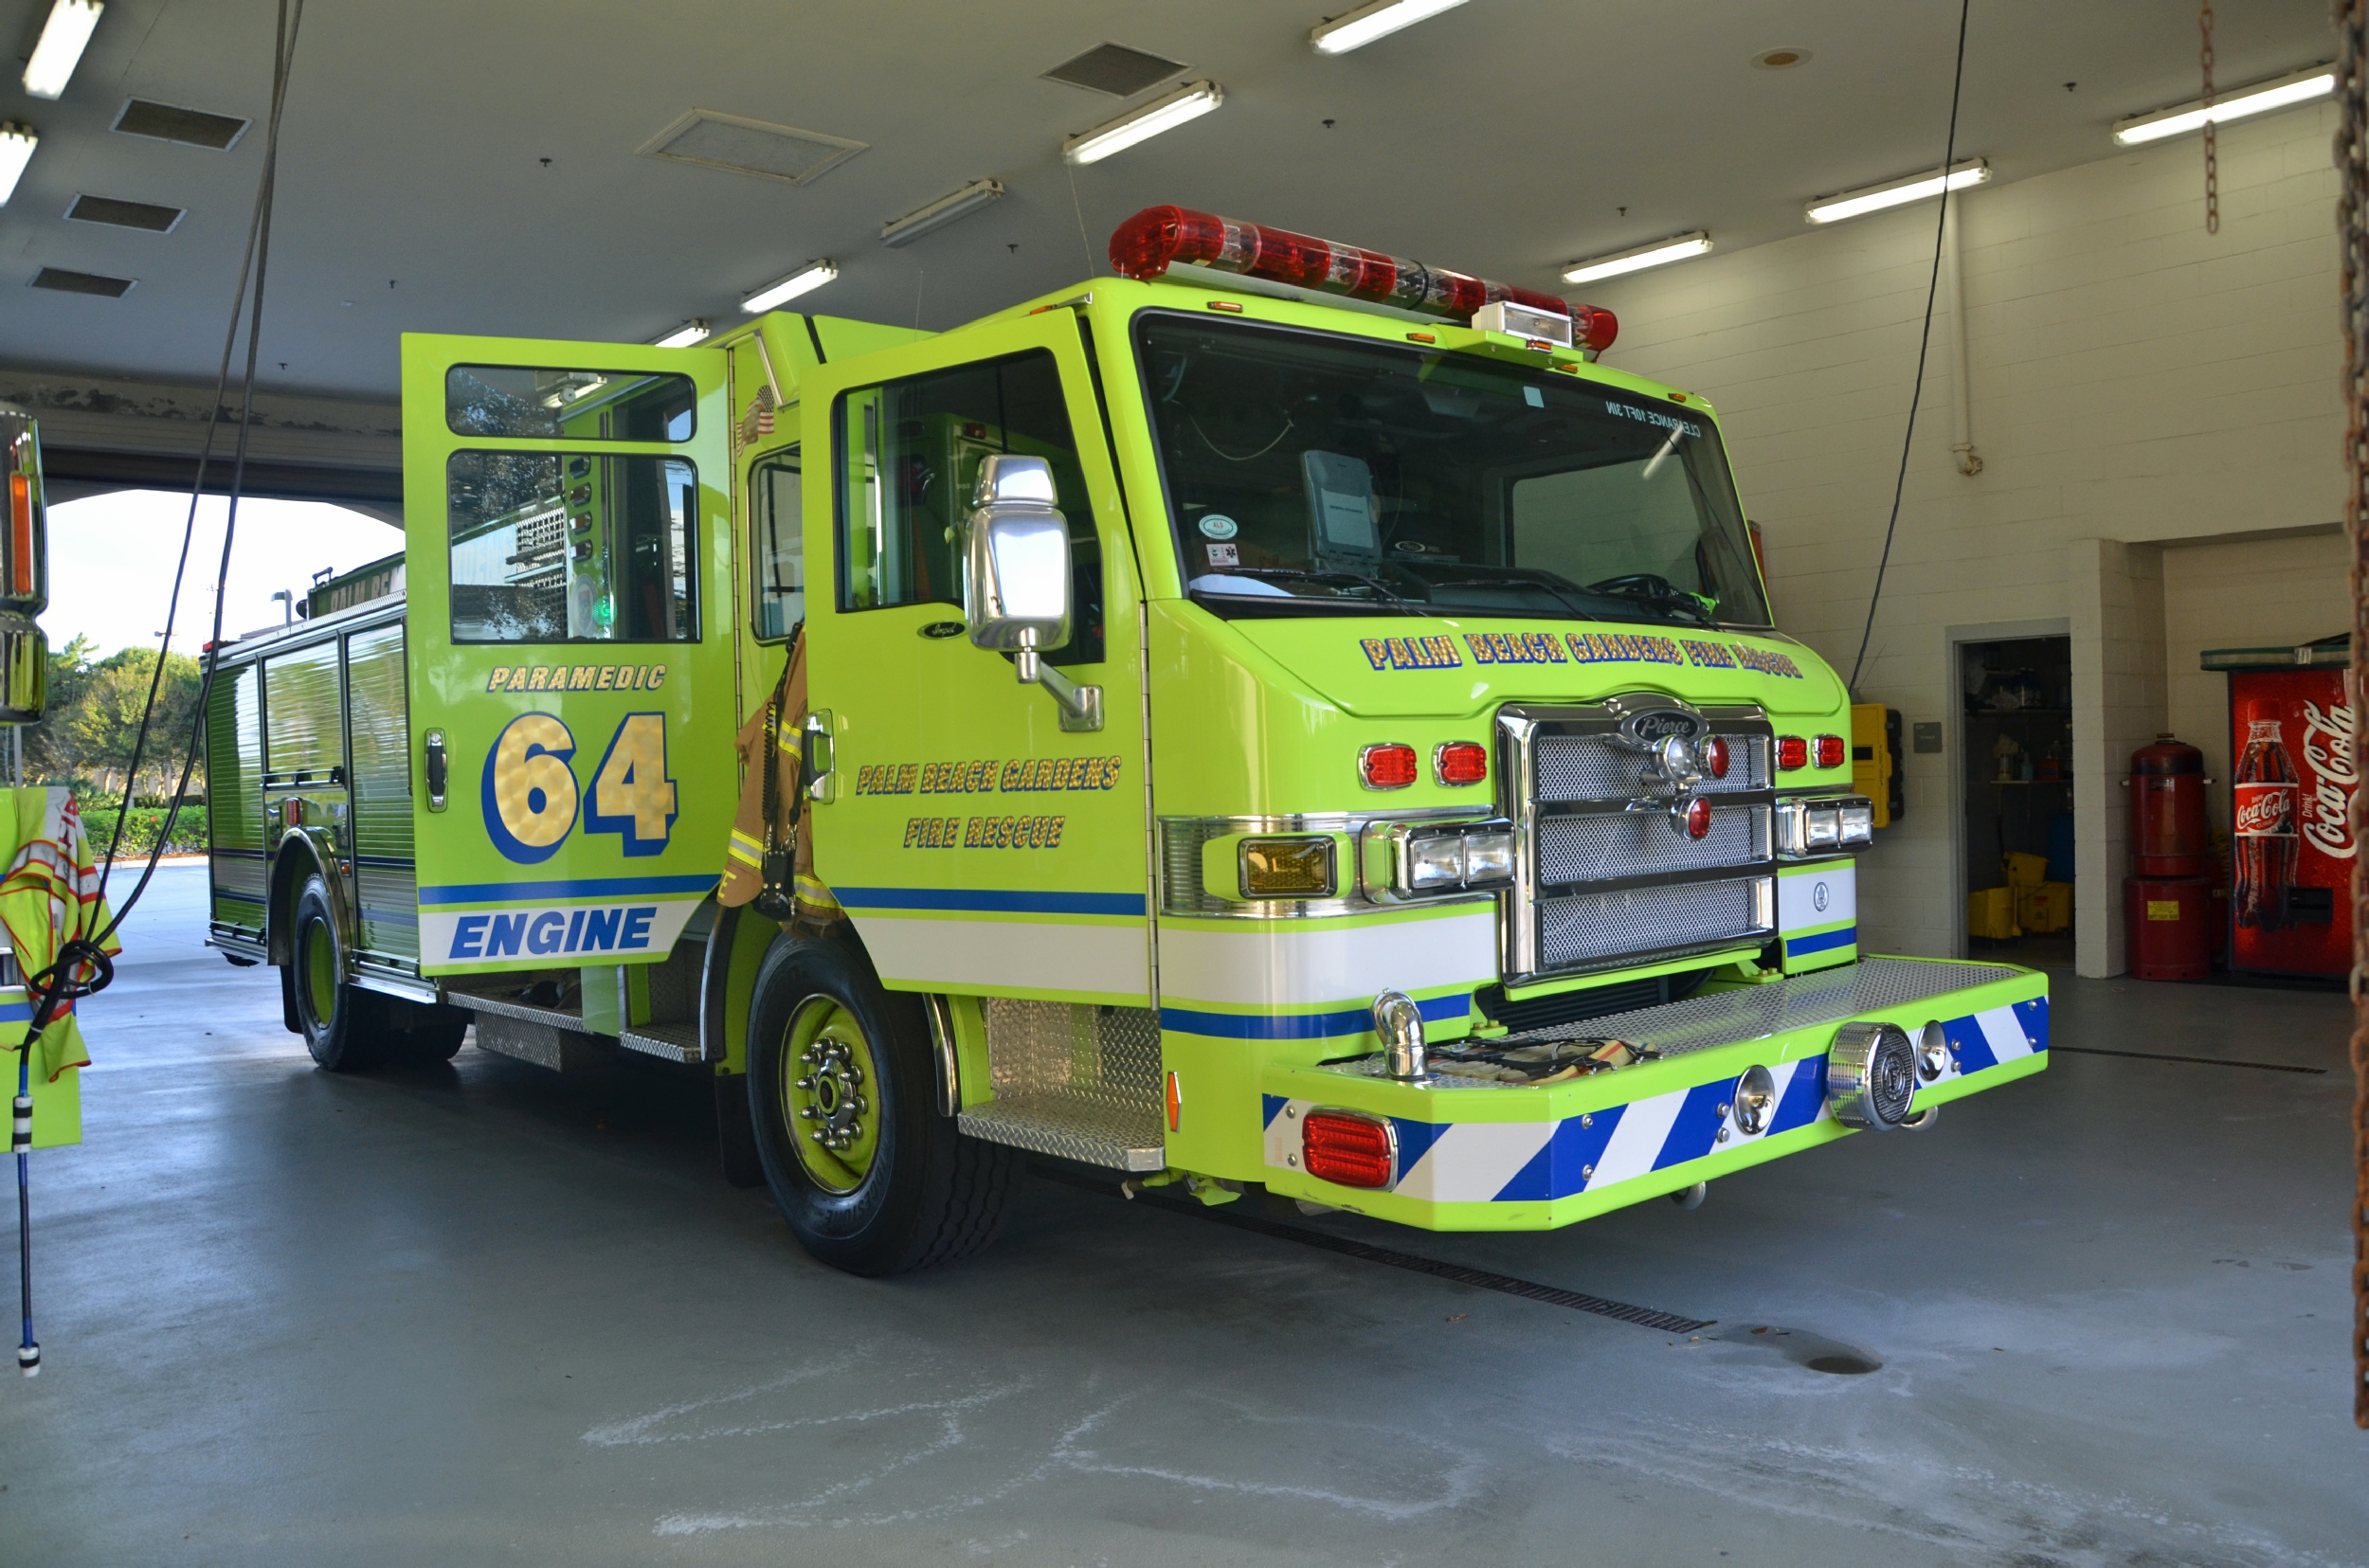 FL, Palm Beach Gardens Fire Department Engine / Ladder